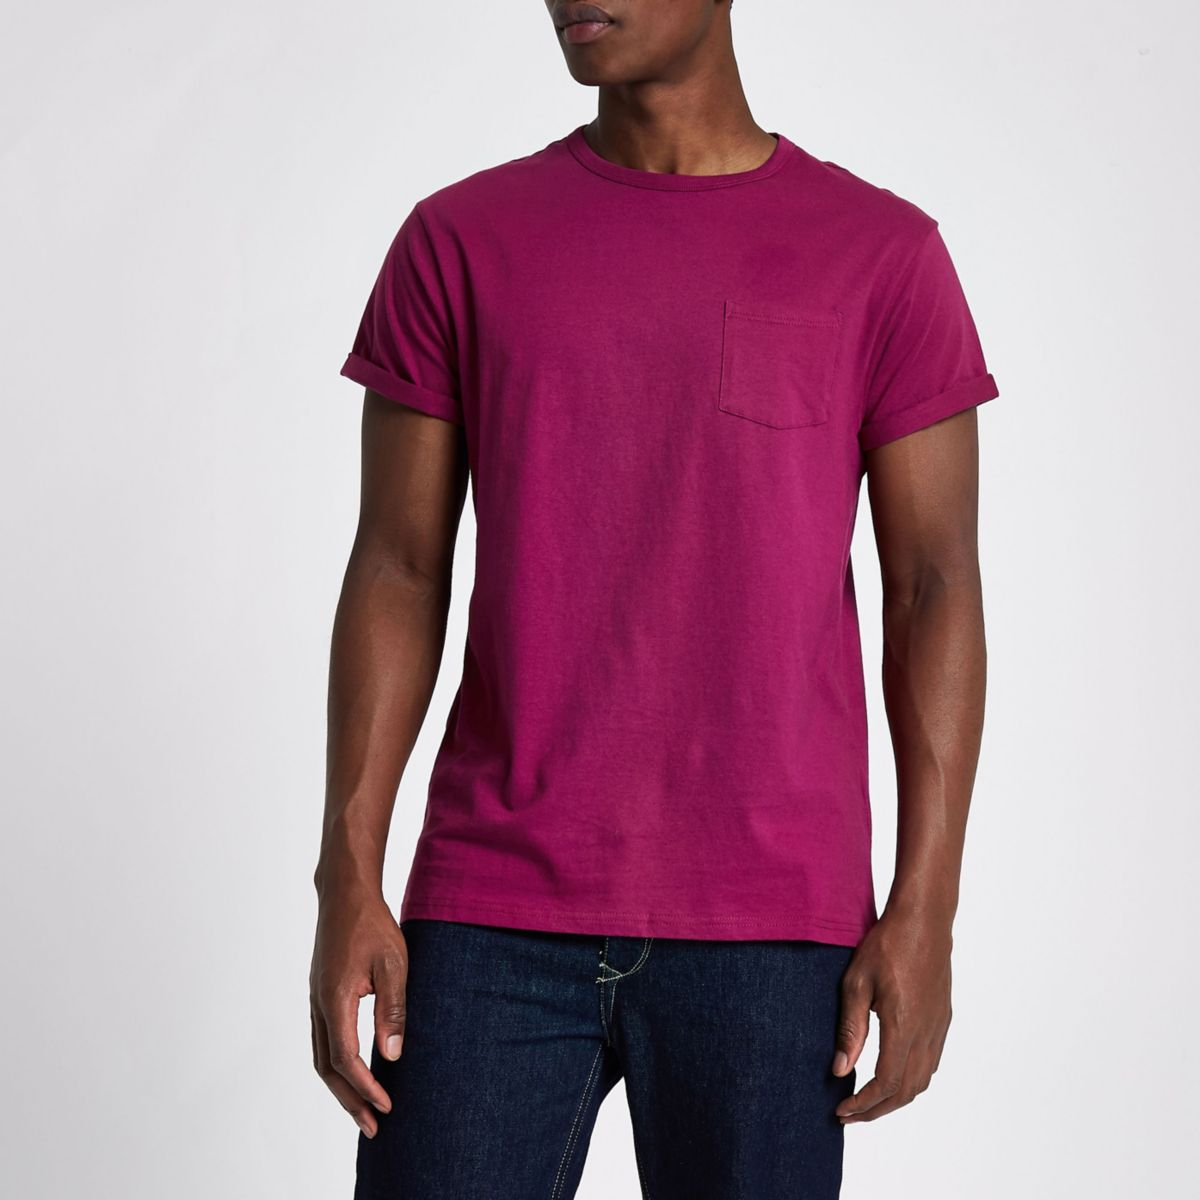 Pink crew neck pocket T-shirt